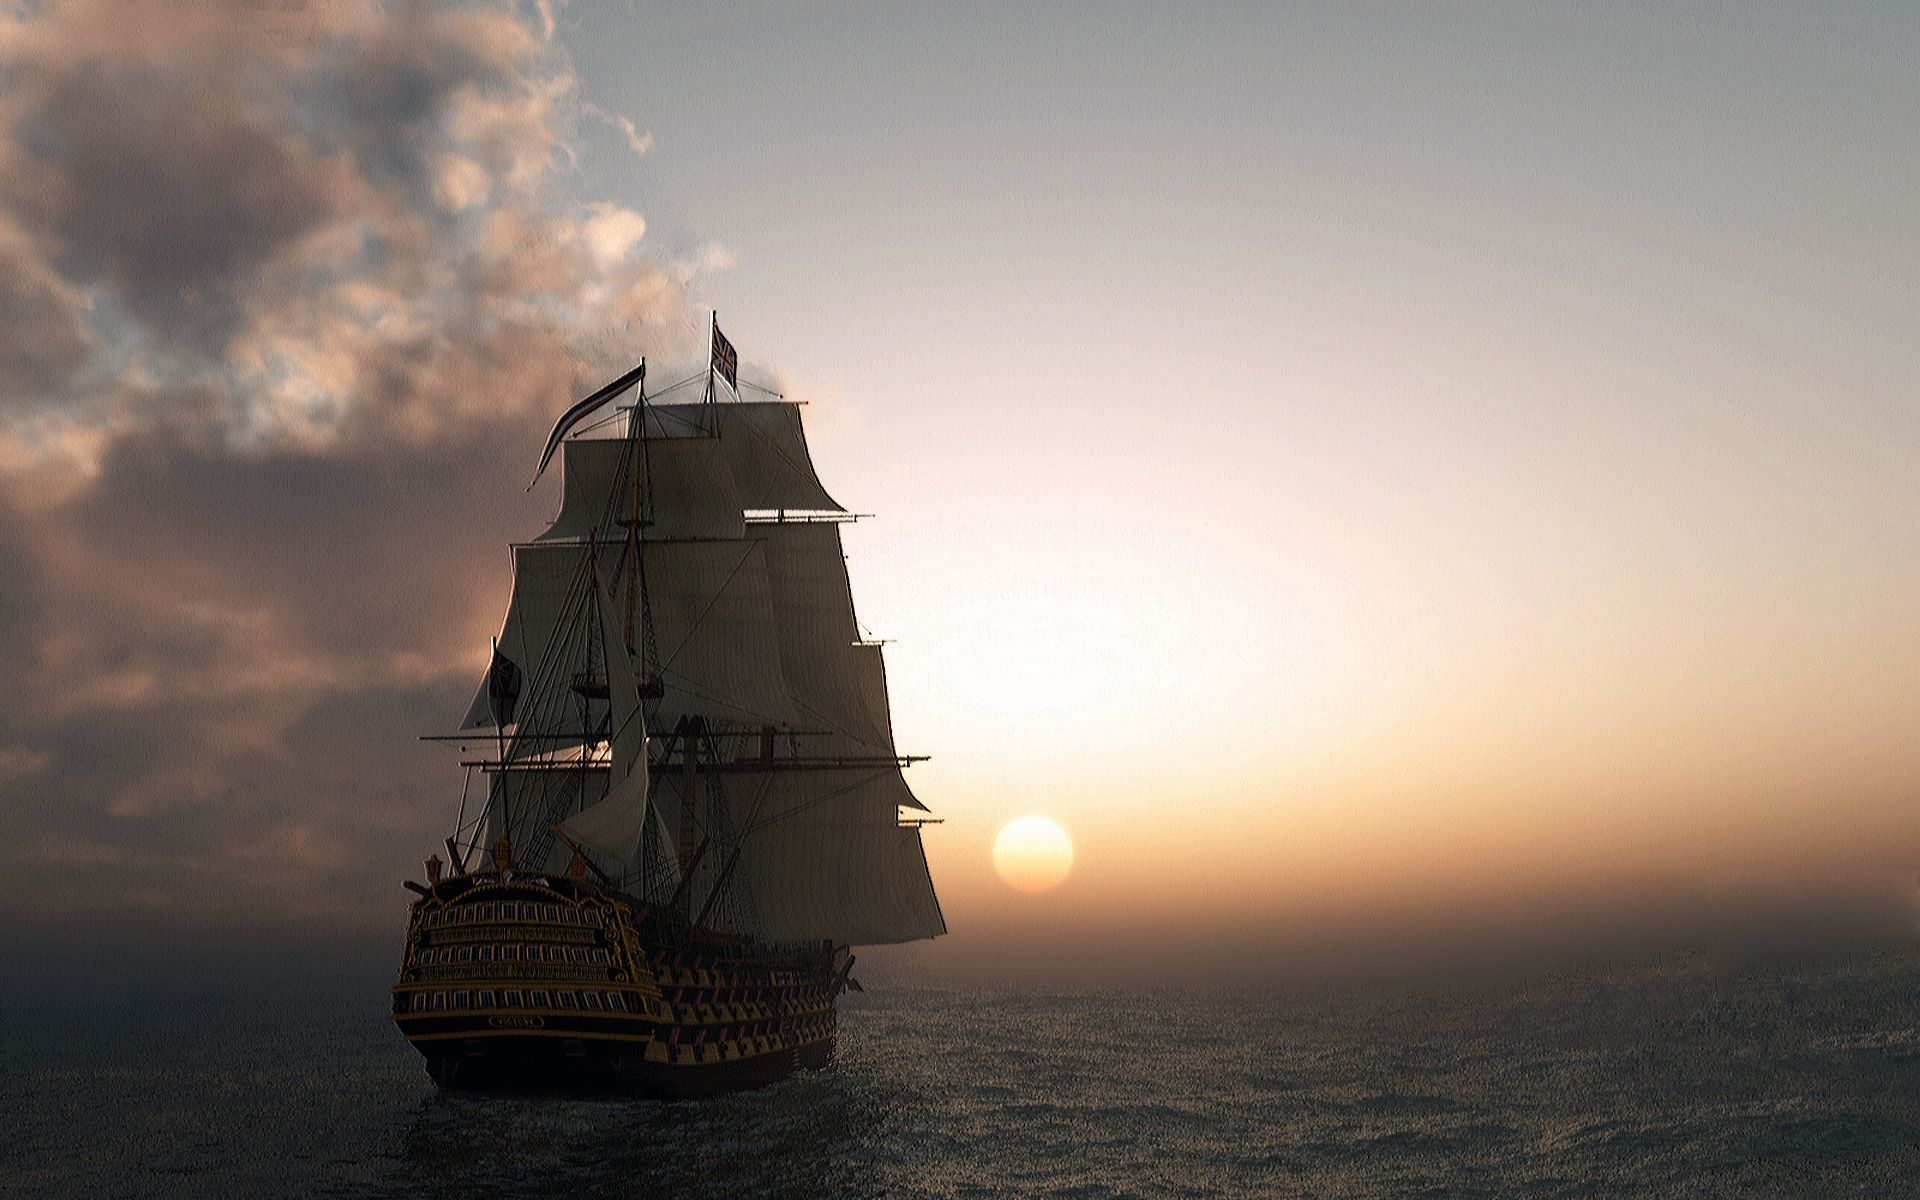 Обои корабль, парусник, Облака. Пейзажи foto 12